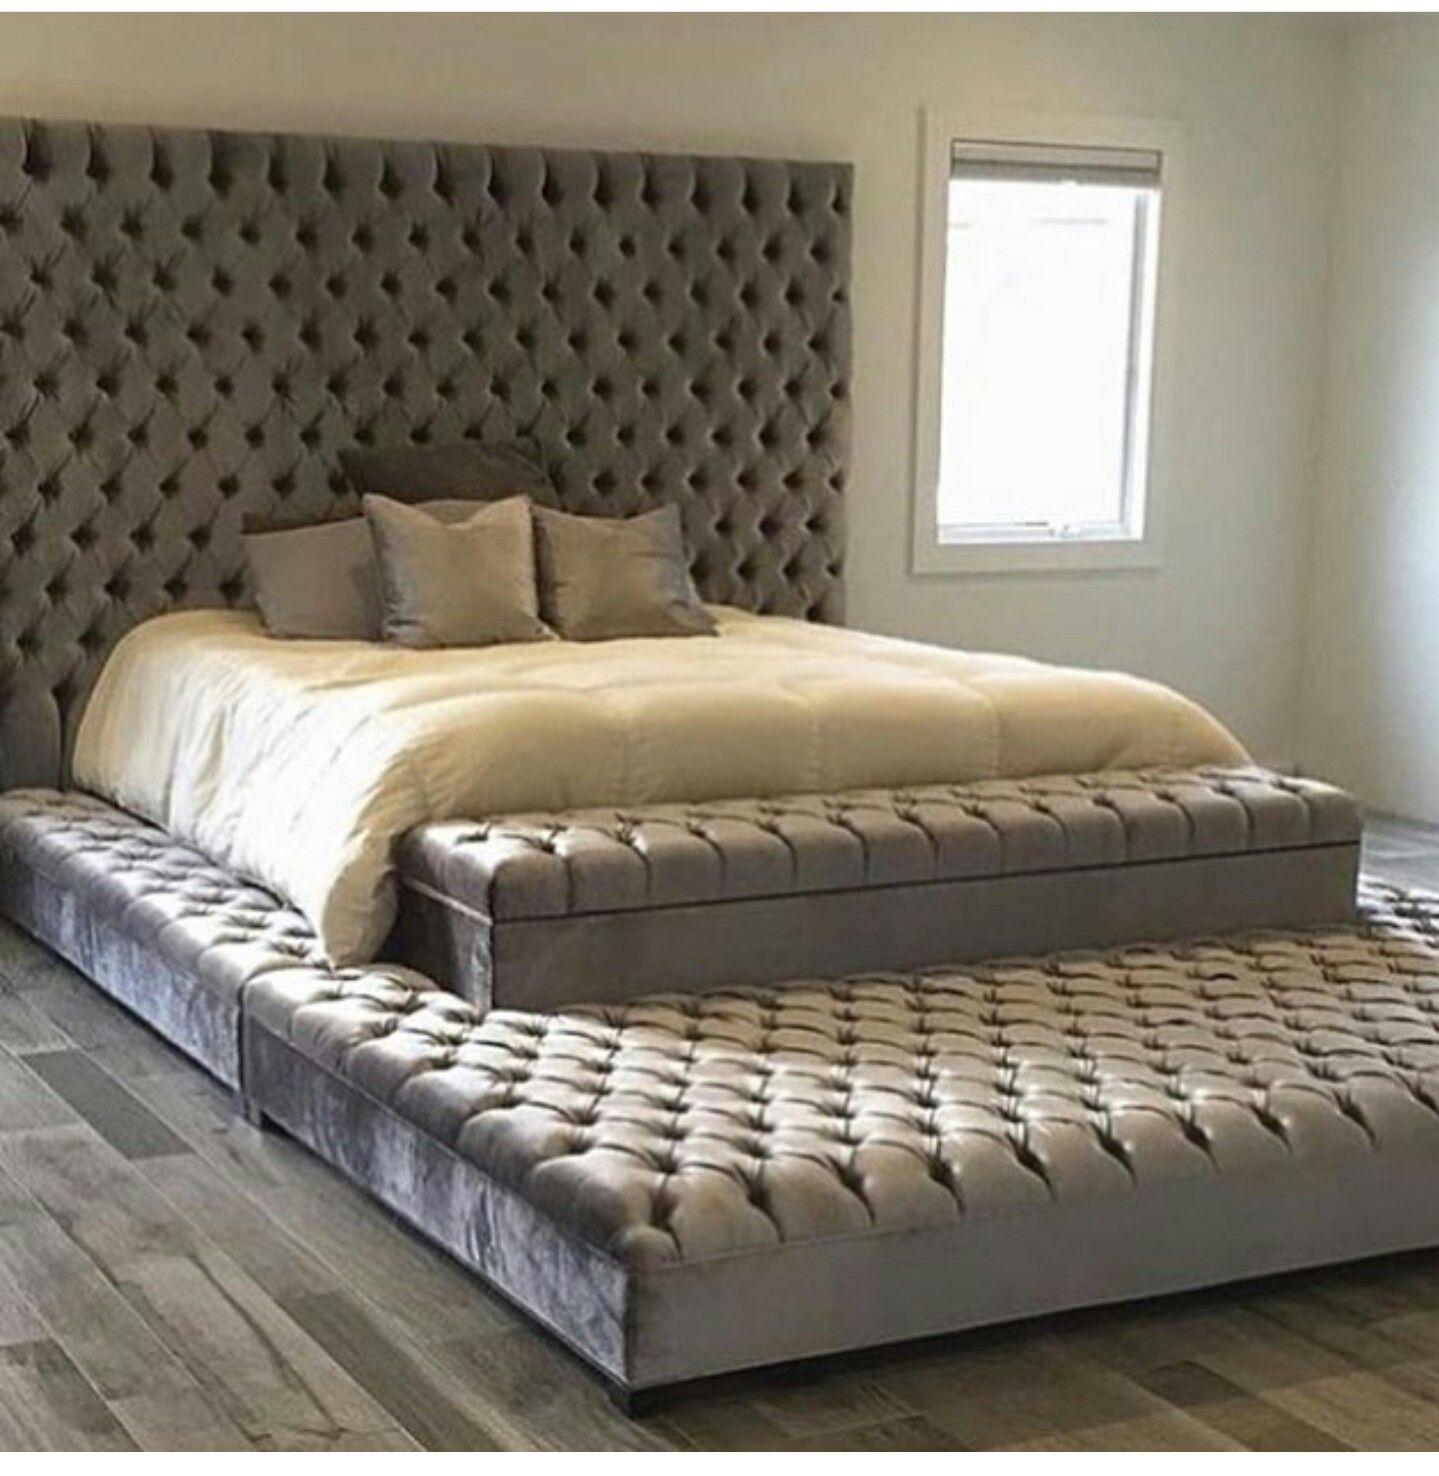 Big Beautiful Bed High Head Board Home Bedroom Master Bedrooms